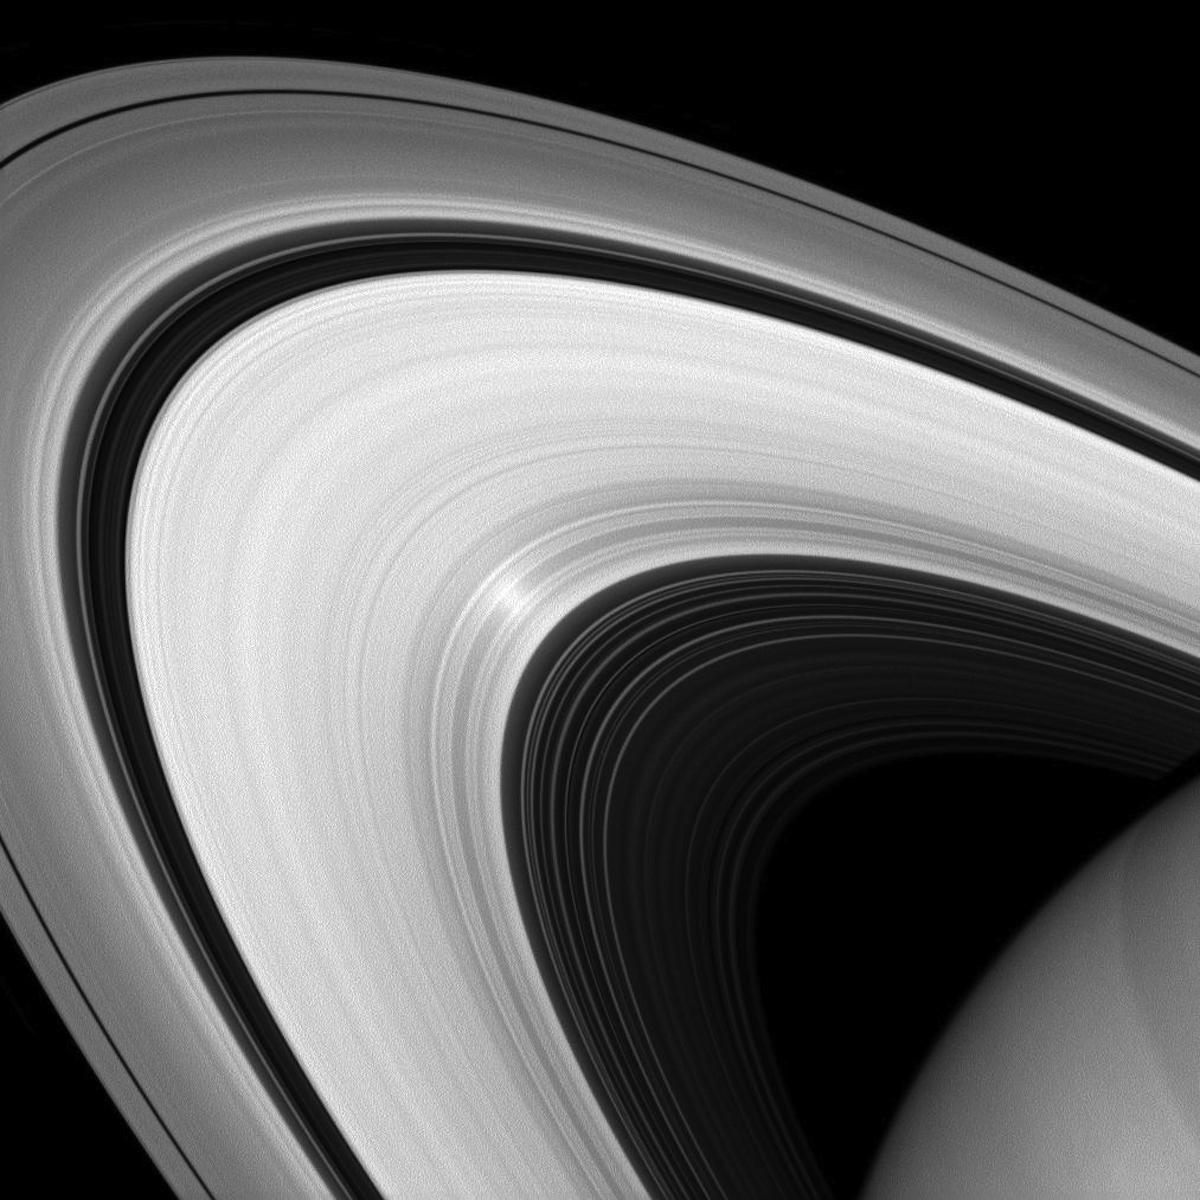 imagenes nunca vistas de saturno tomadas por la sonda cassini 2